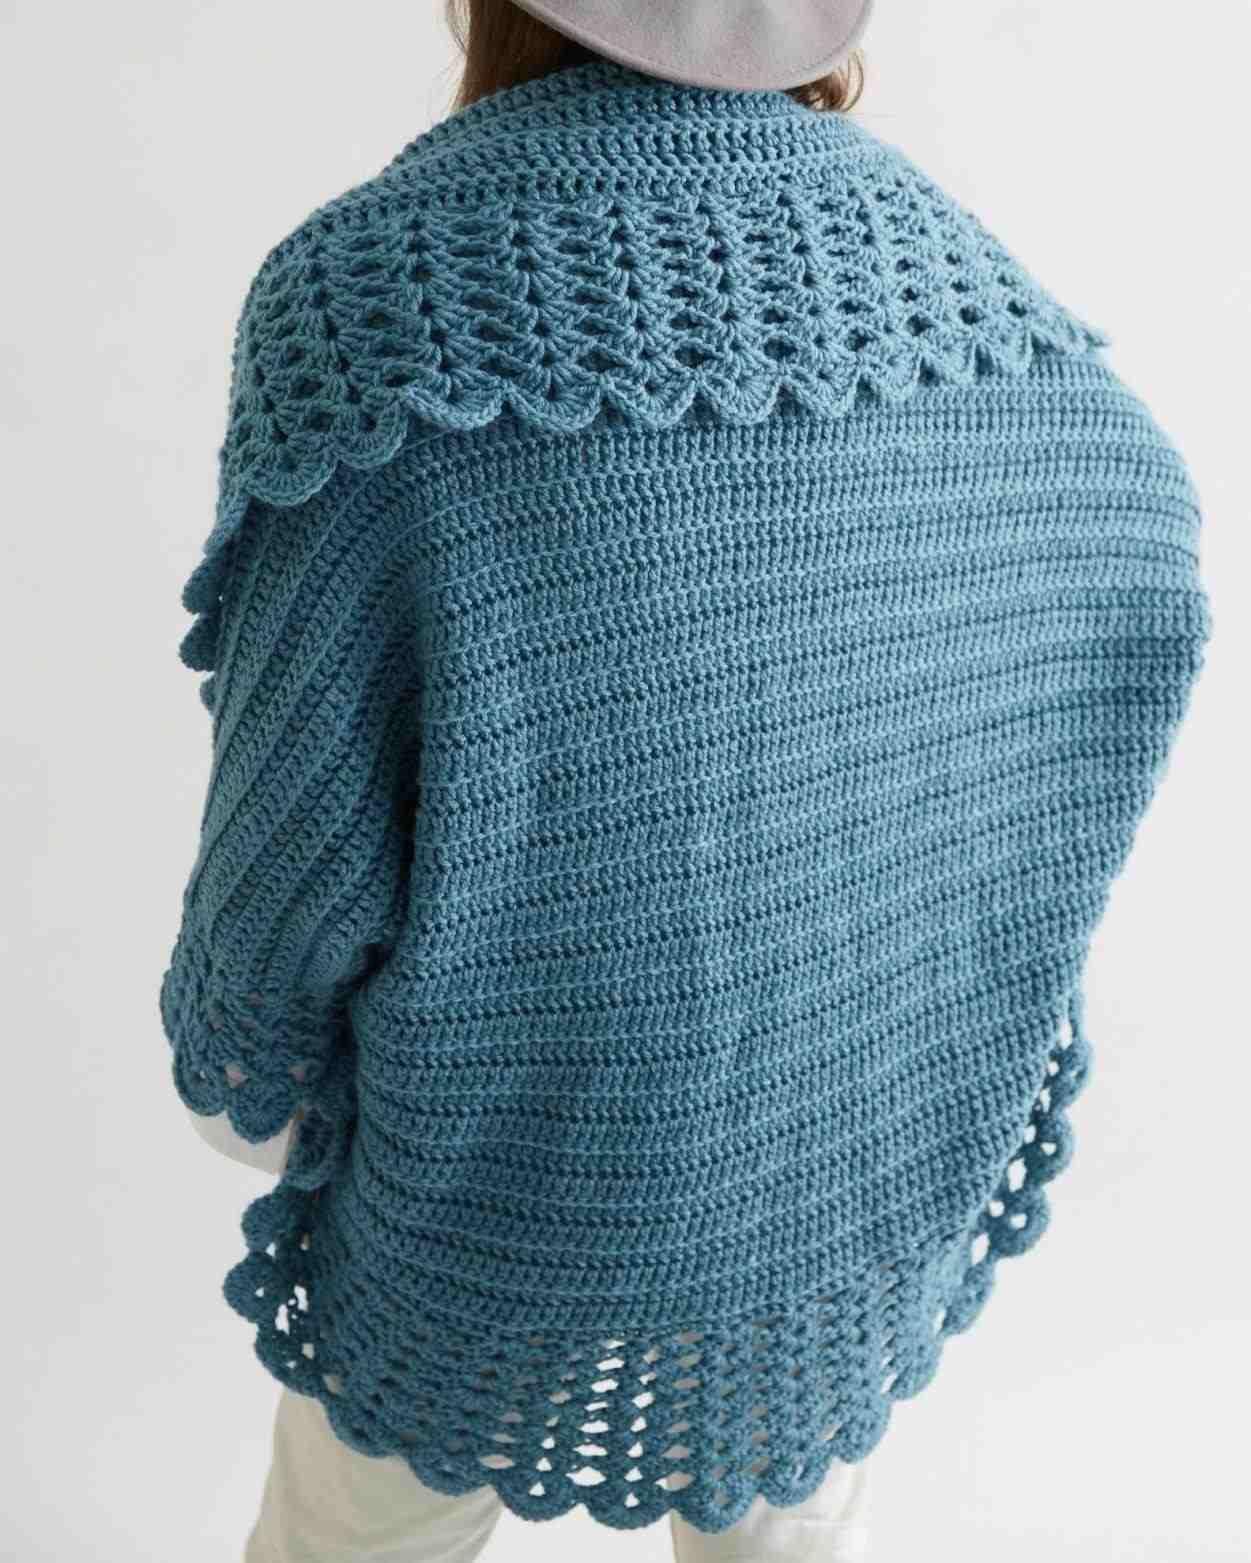 0125d46742c54b Crochet Jacket - crochet boho jacket by aisha crochet. cabled crochet jacket  chameleon style by briana k designs. ss17 pepperland leather and crochet ...